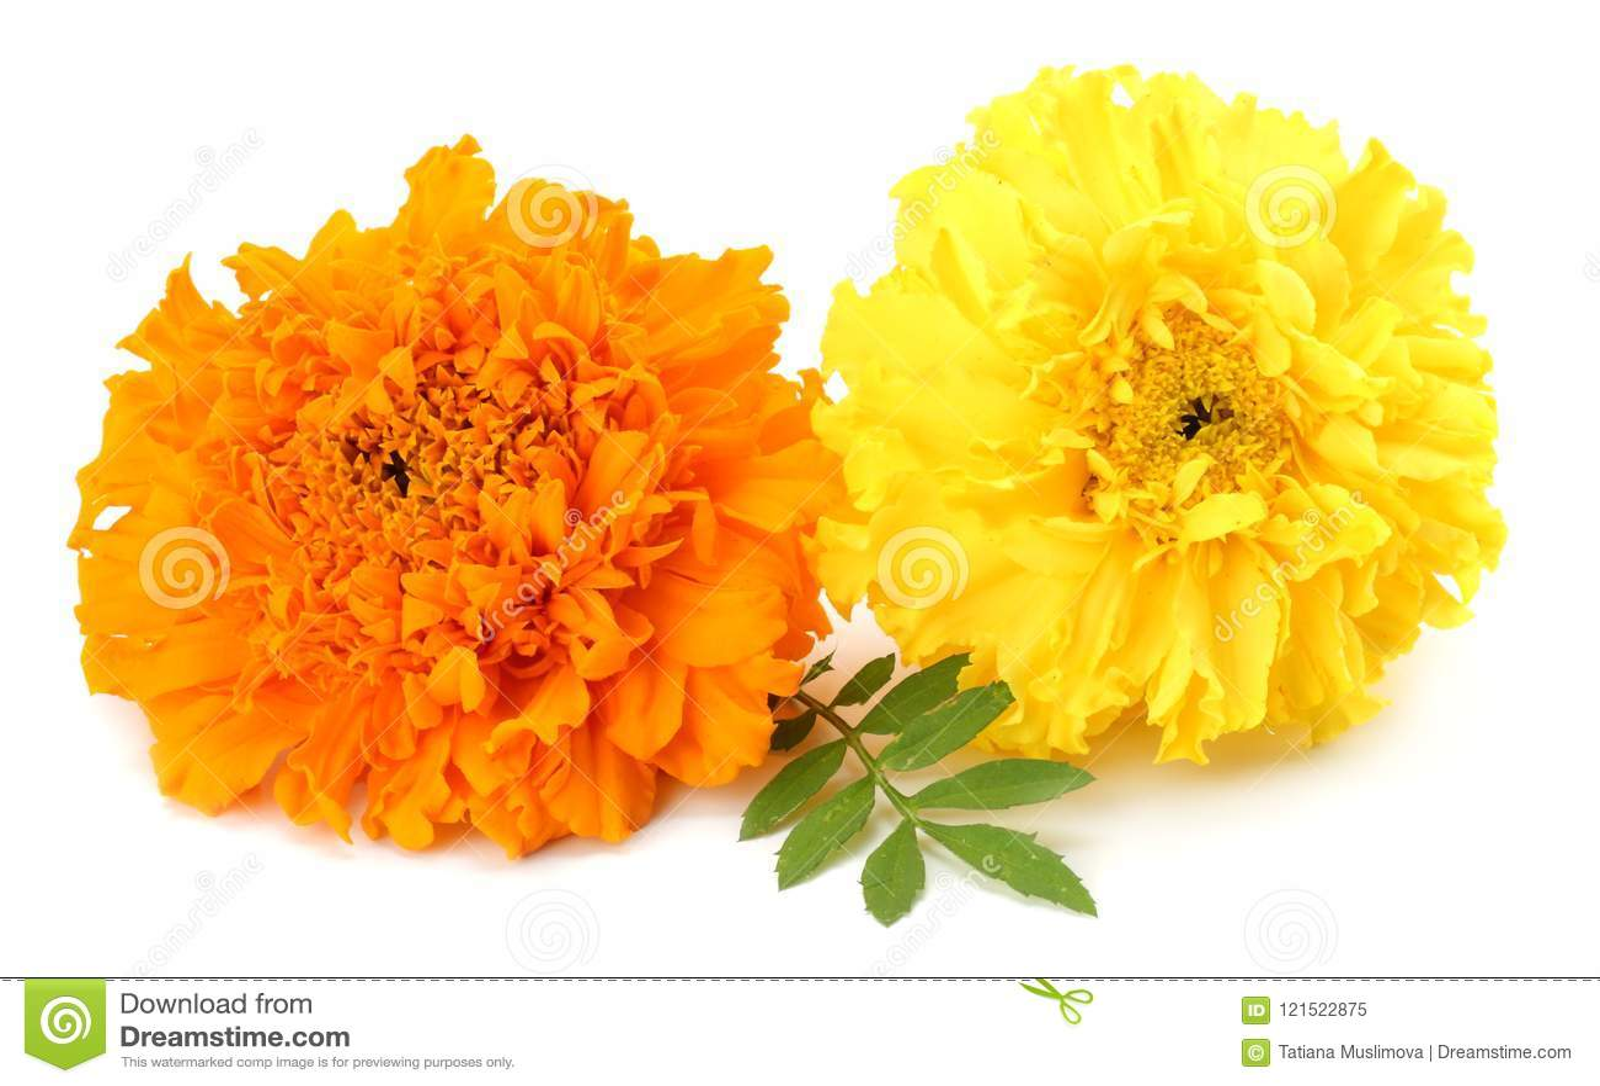 Gelbe Ringelblumenblume, Tagetes-erecta, mexikanische Ringelblume, aztekische Ringelblume, afrikanische Ringelblume lokalisiert a